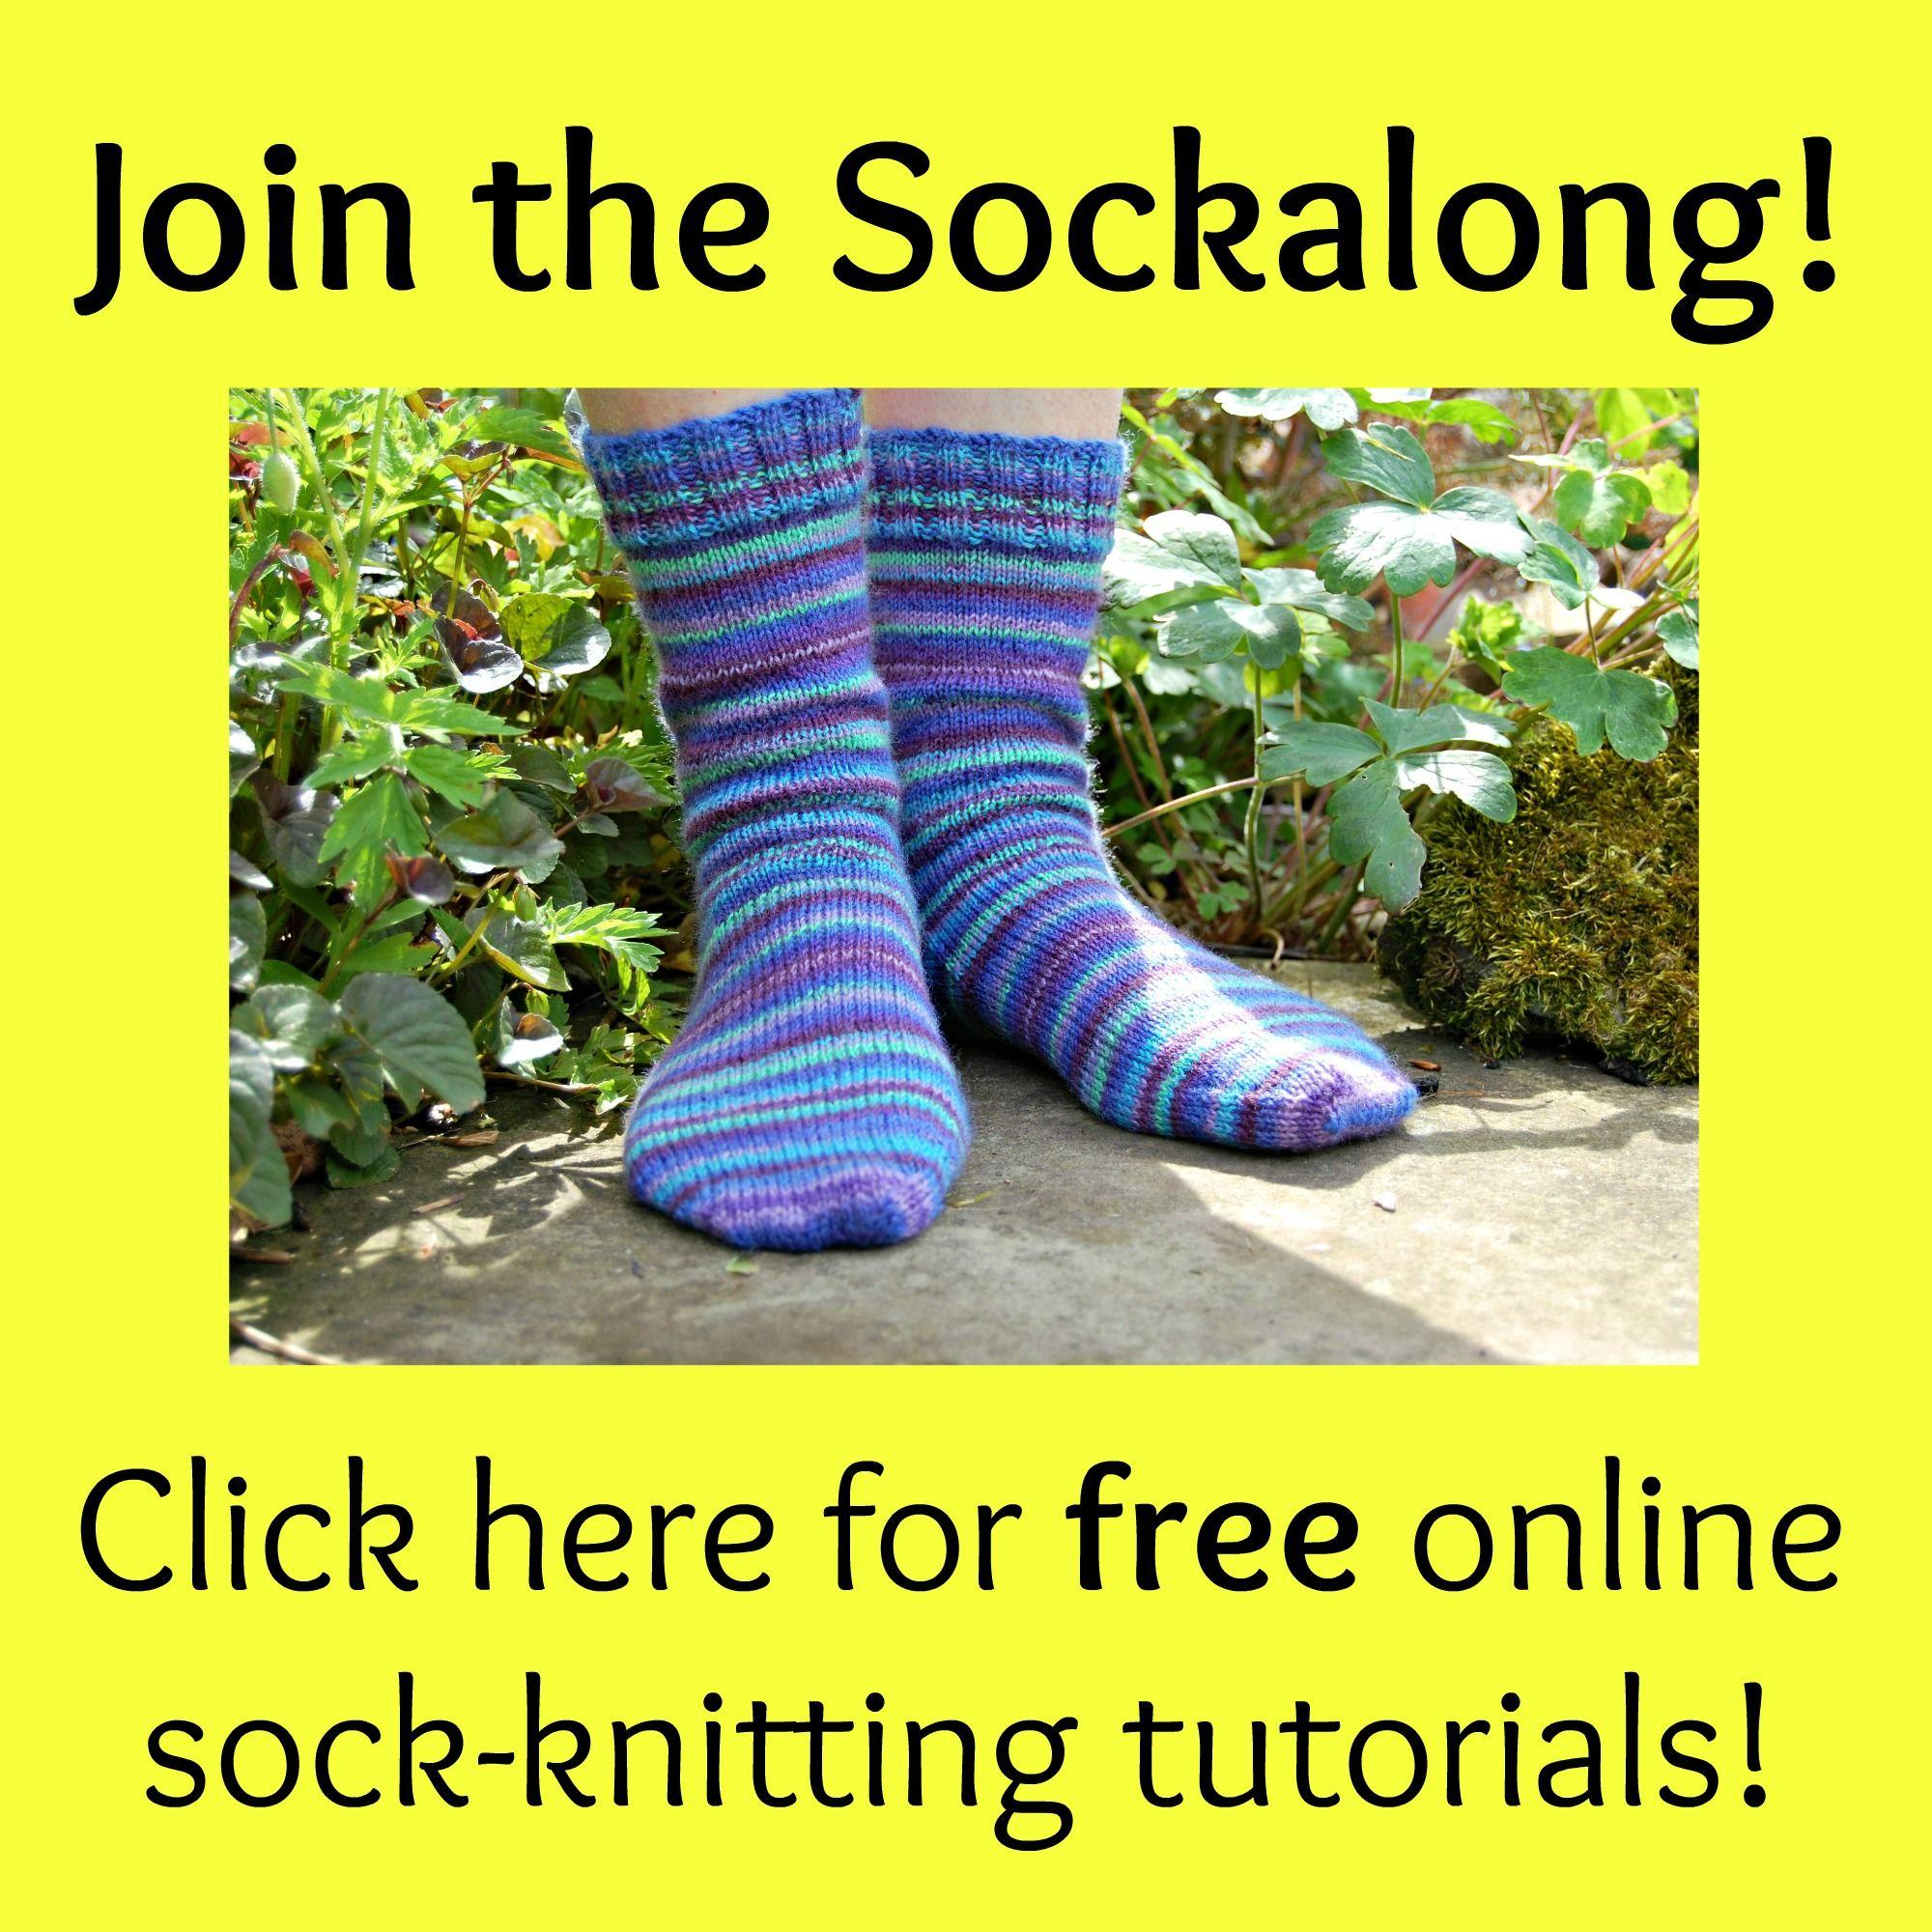 All The Winwick Mum Sockalong Tutorials In One Place Www Winwickmum Blogspot Com P Sockalong Html Sock Knitting Patterns Sock Patterns Knitting Socks